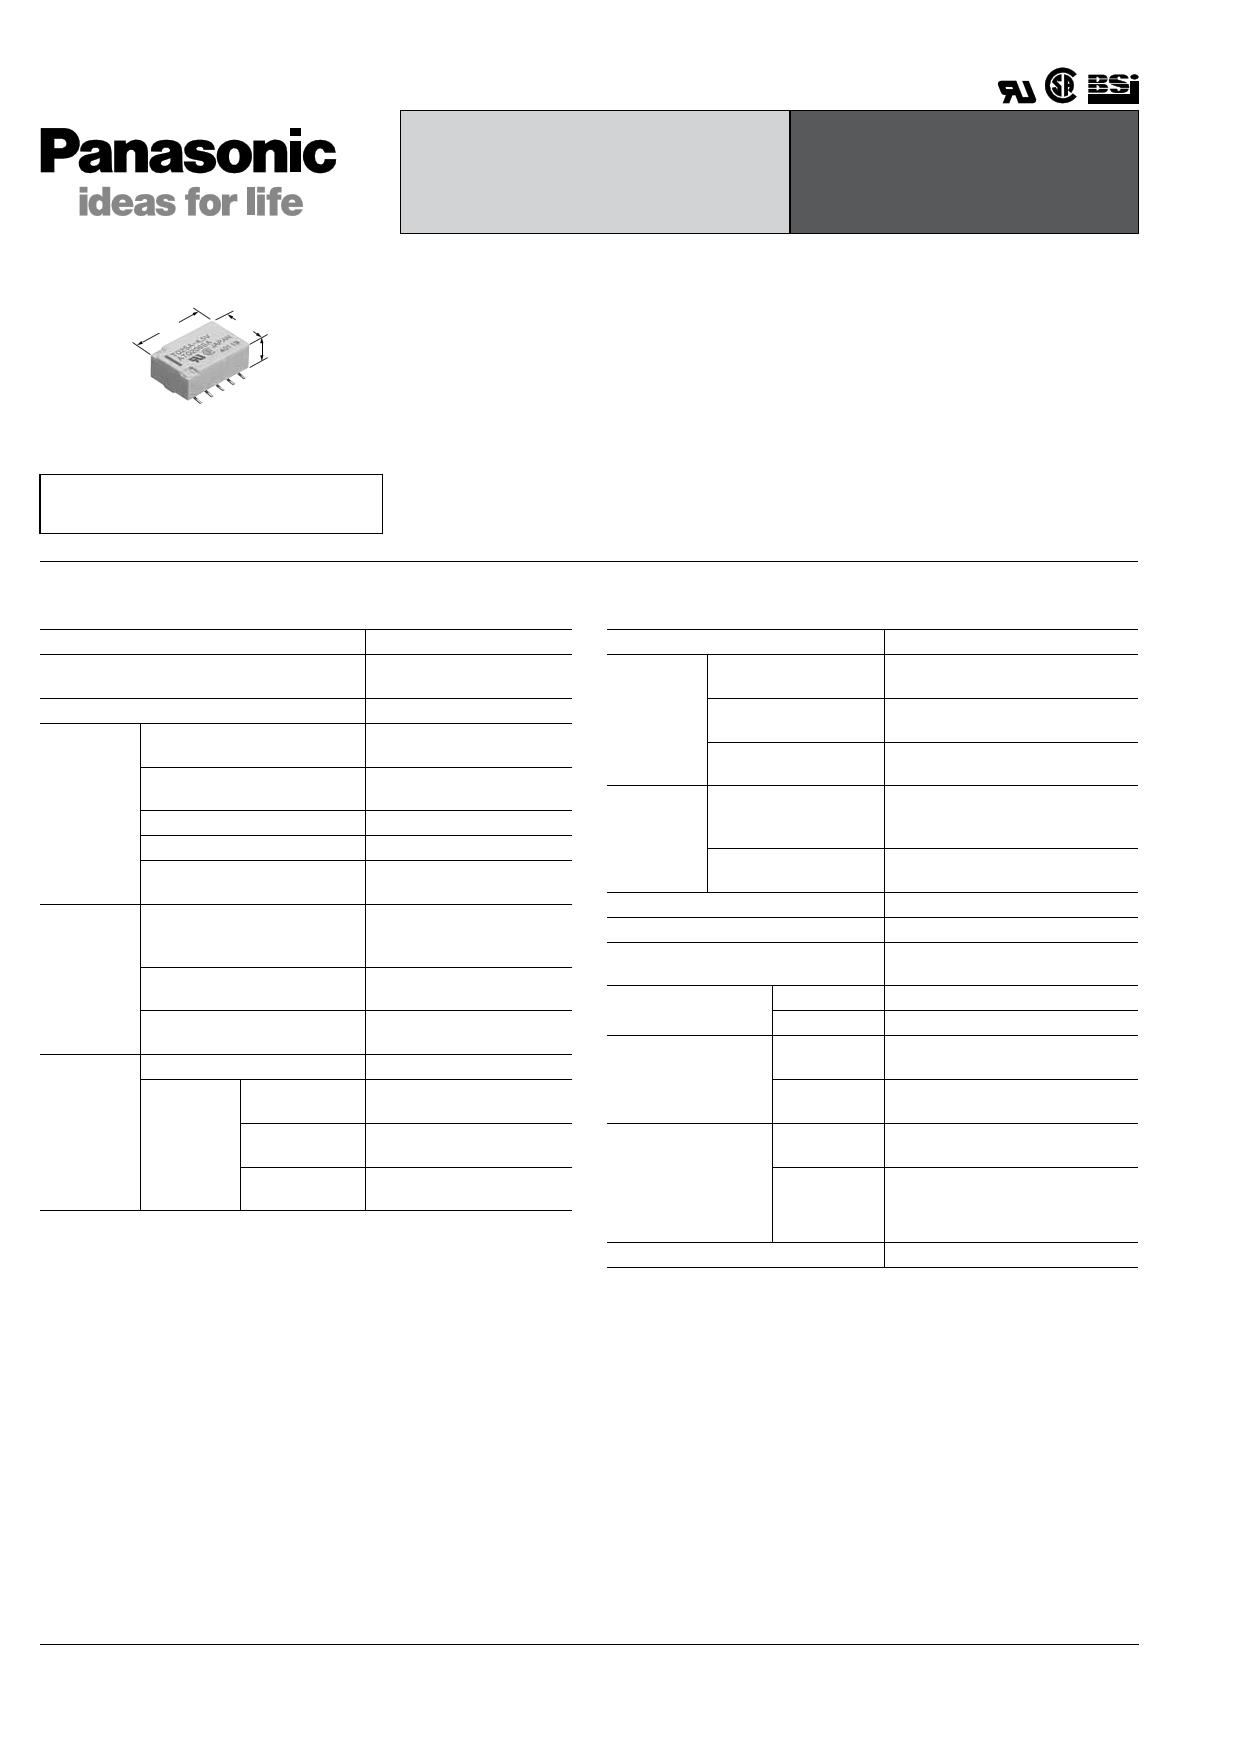 TQ2SL-L2-24V 데이터시트 및 TQ2SL-L2-24V PDF